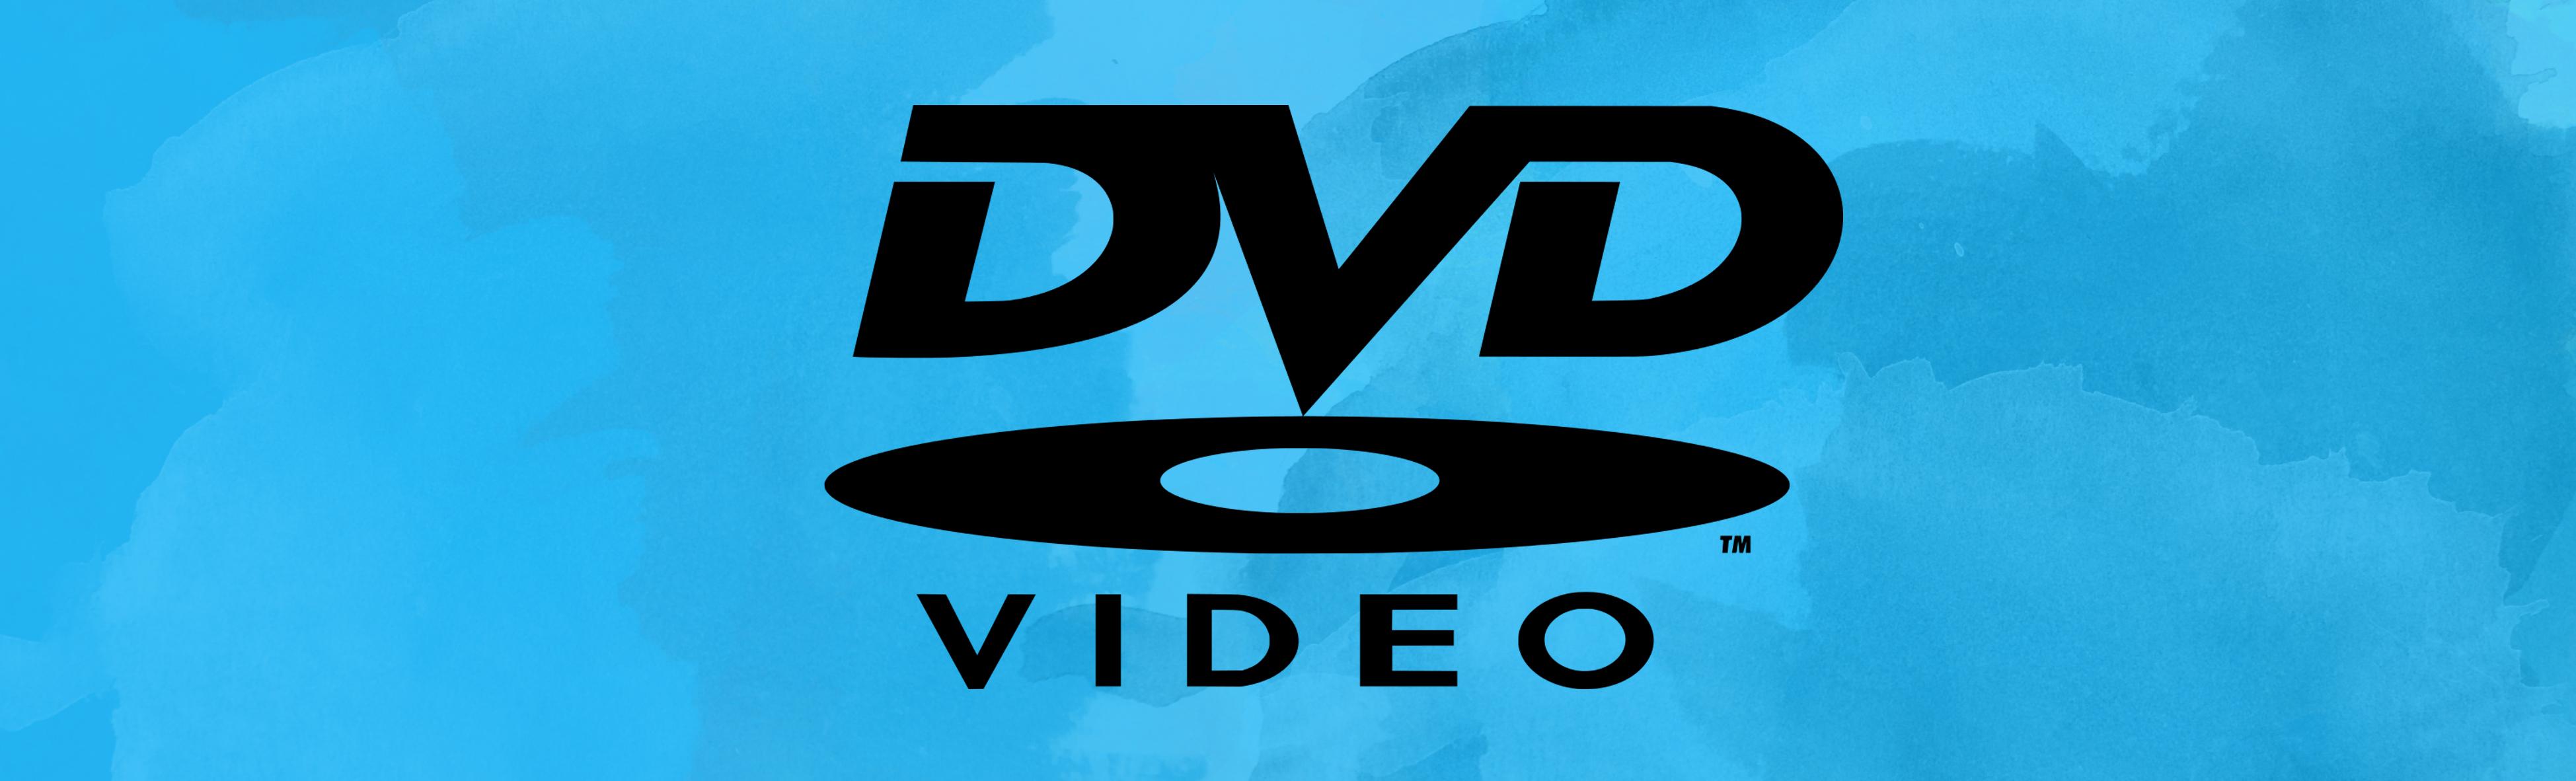 dvdbanner.jpg